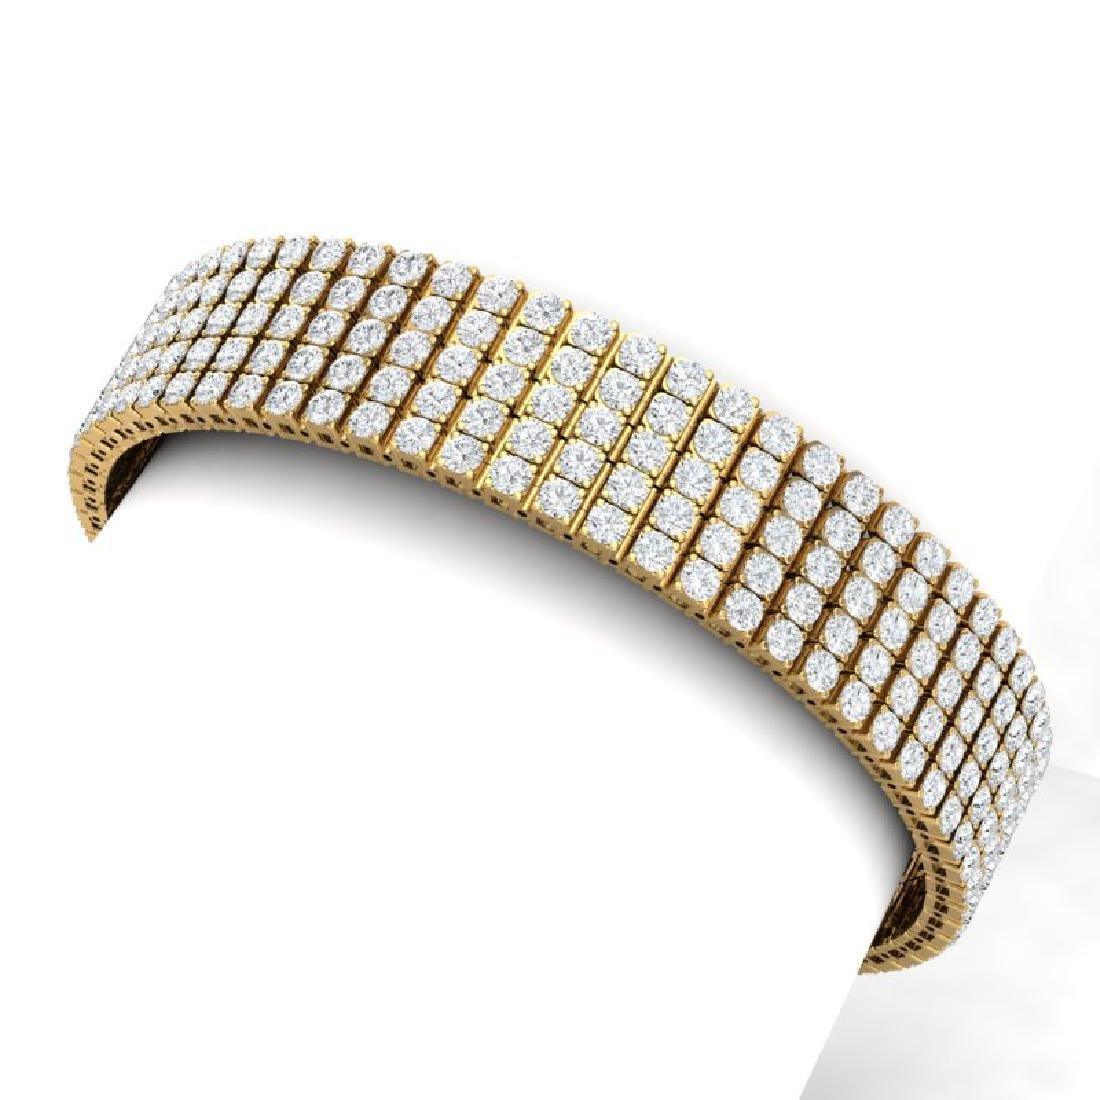 20 CTW Certified VS/SI Diamond Bracelet 18K Yellow Gold